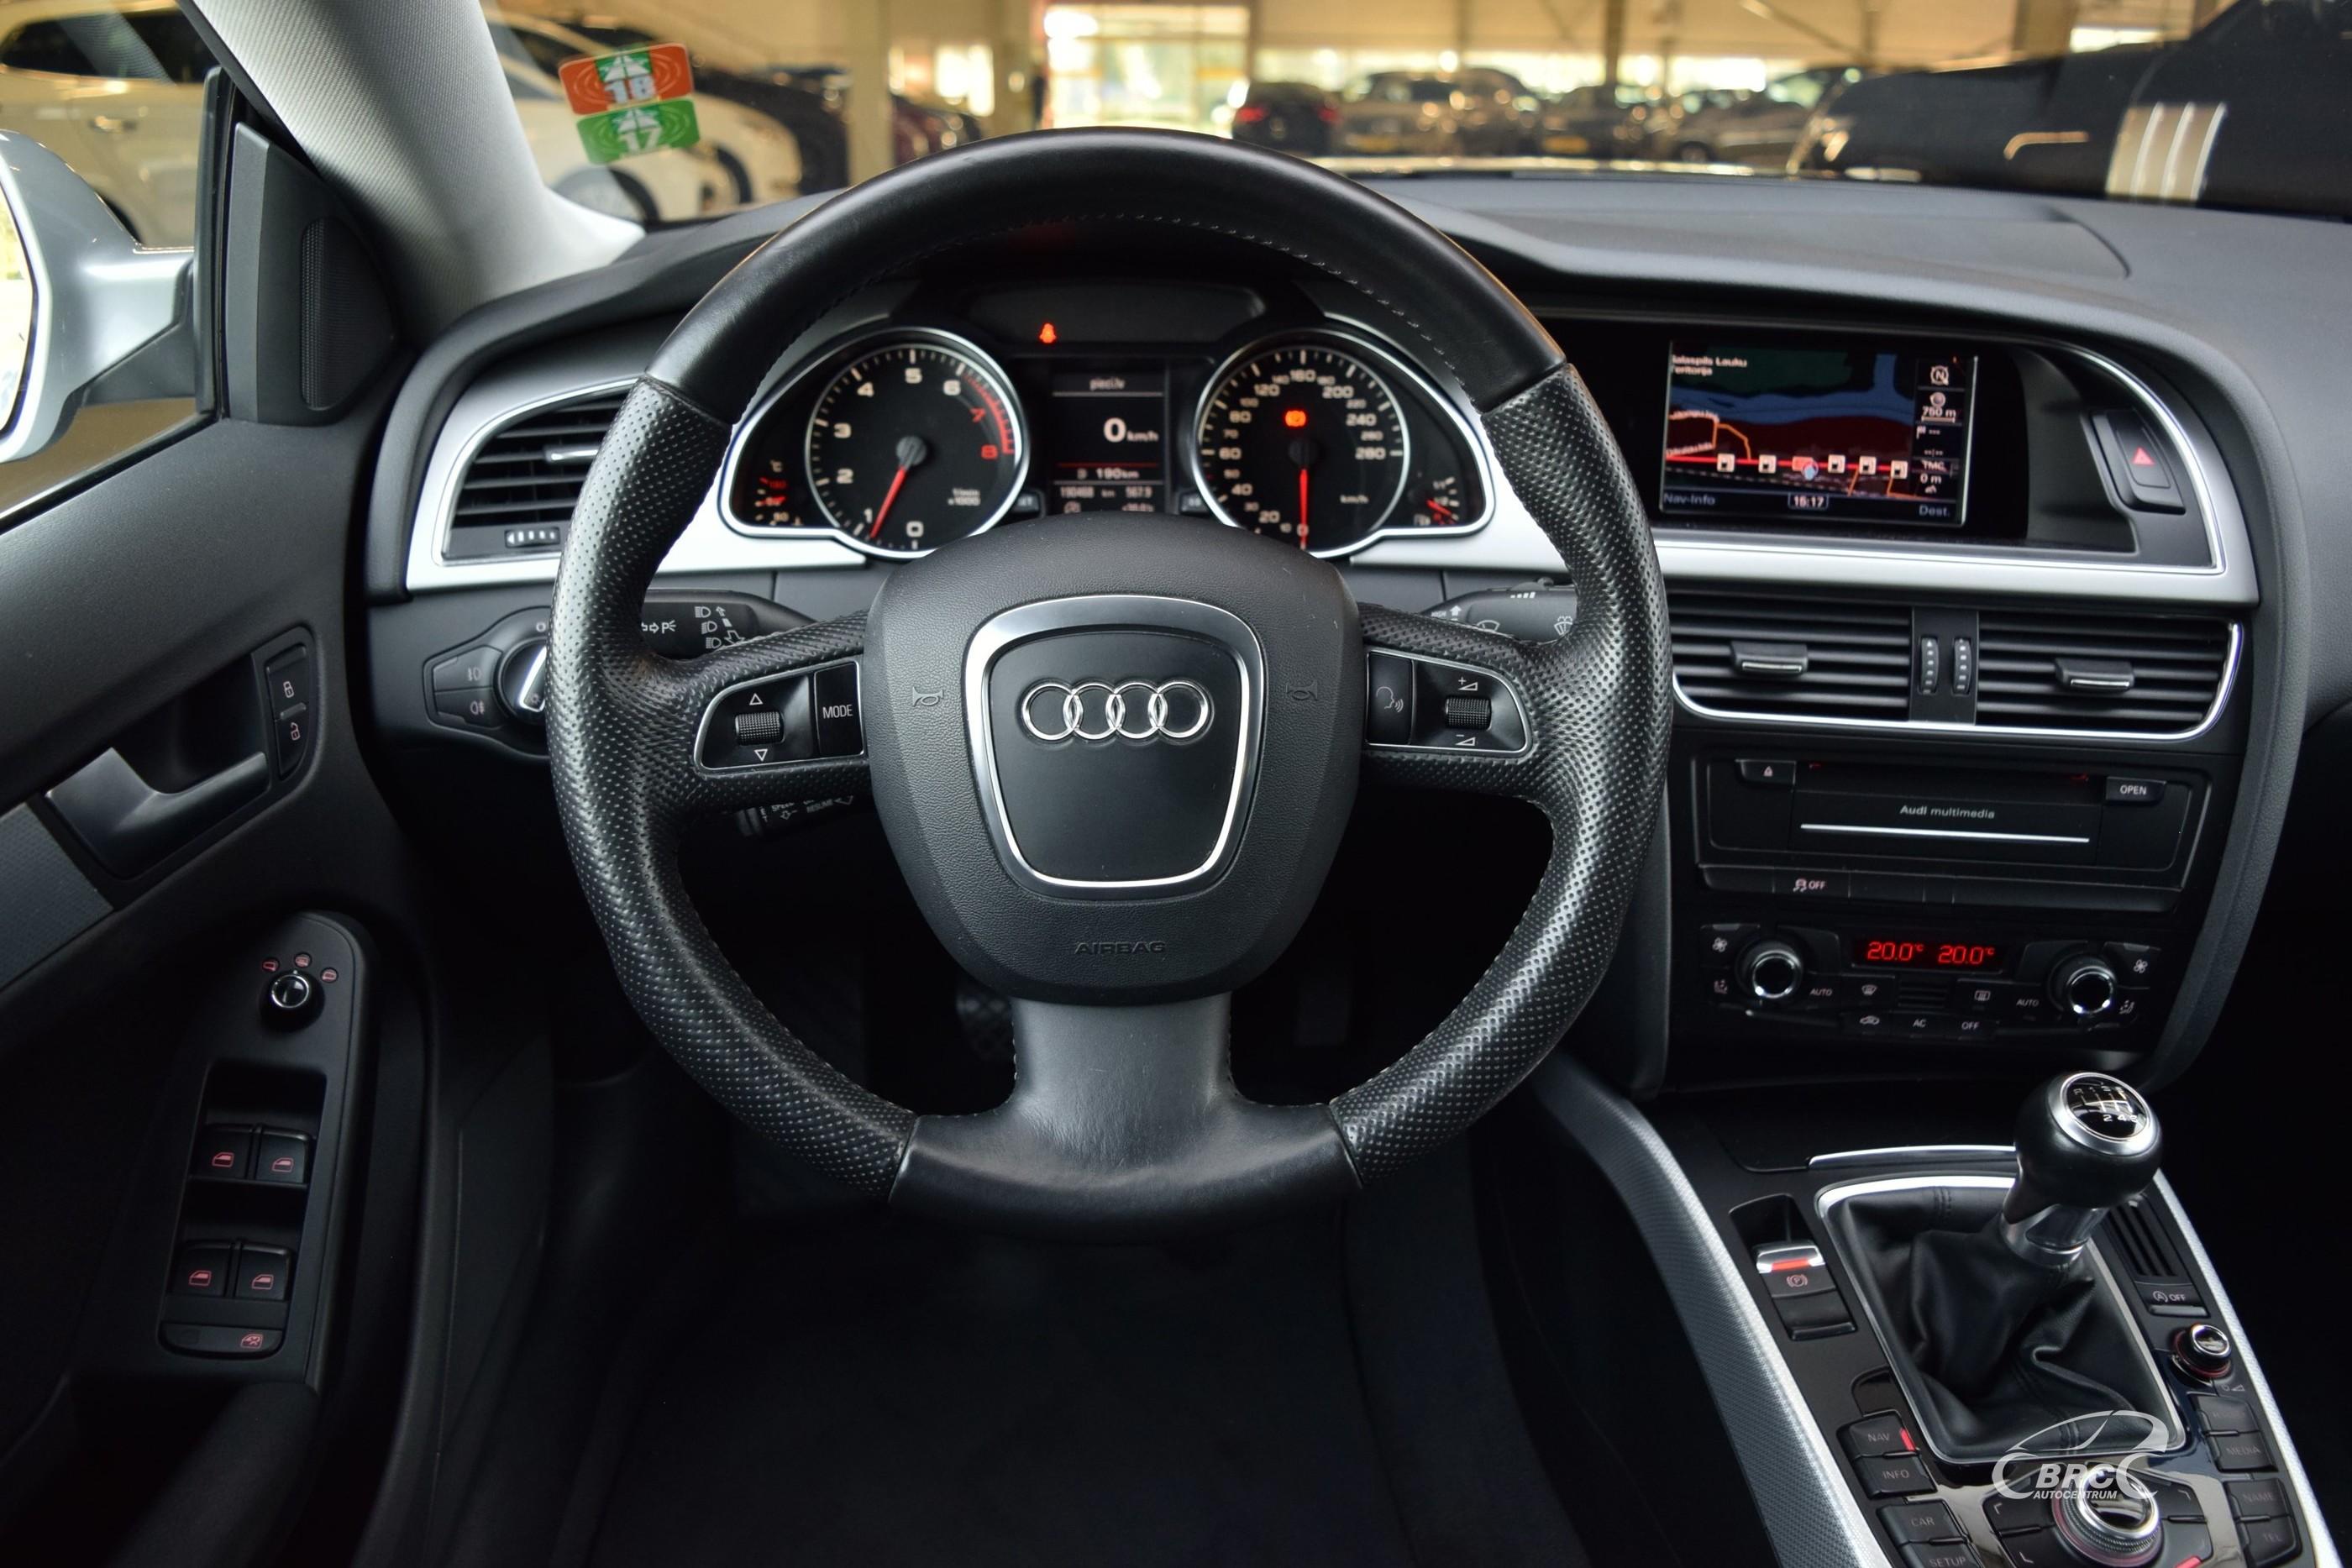 Audi A5 Sportback TFSi M/T